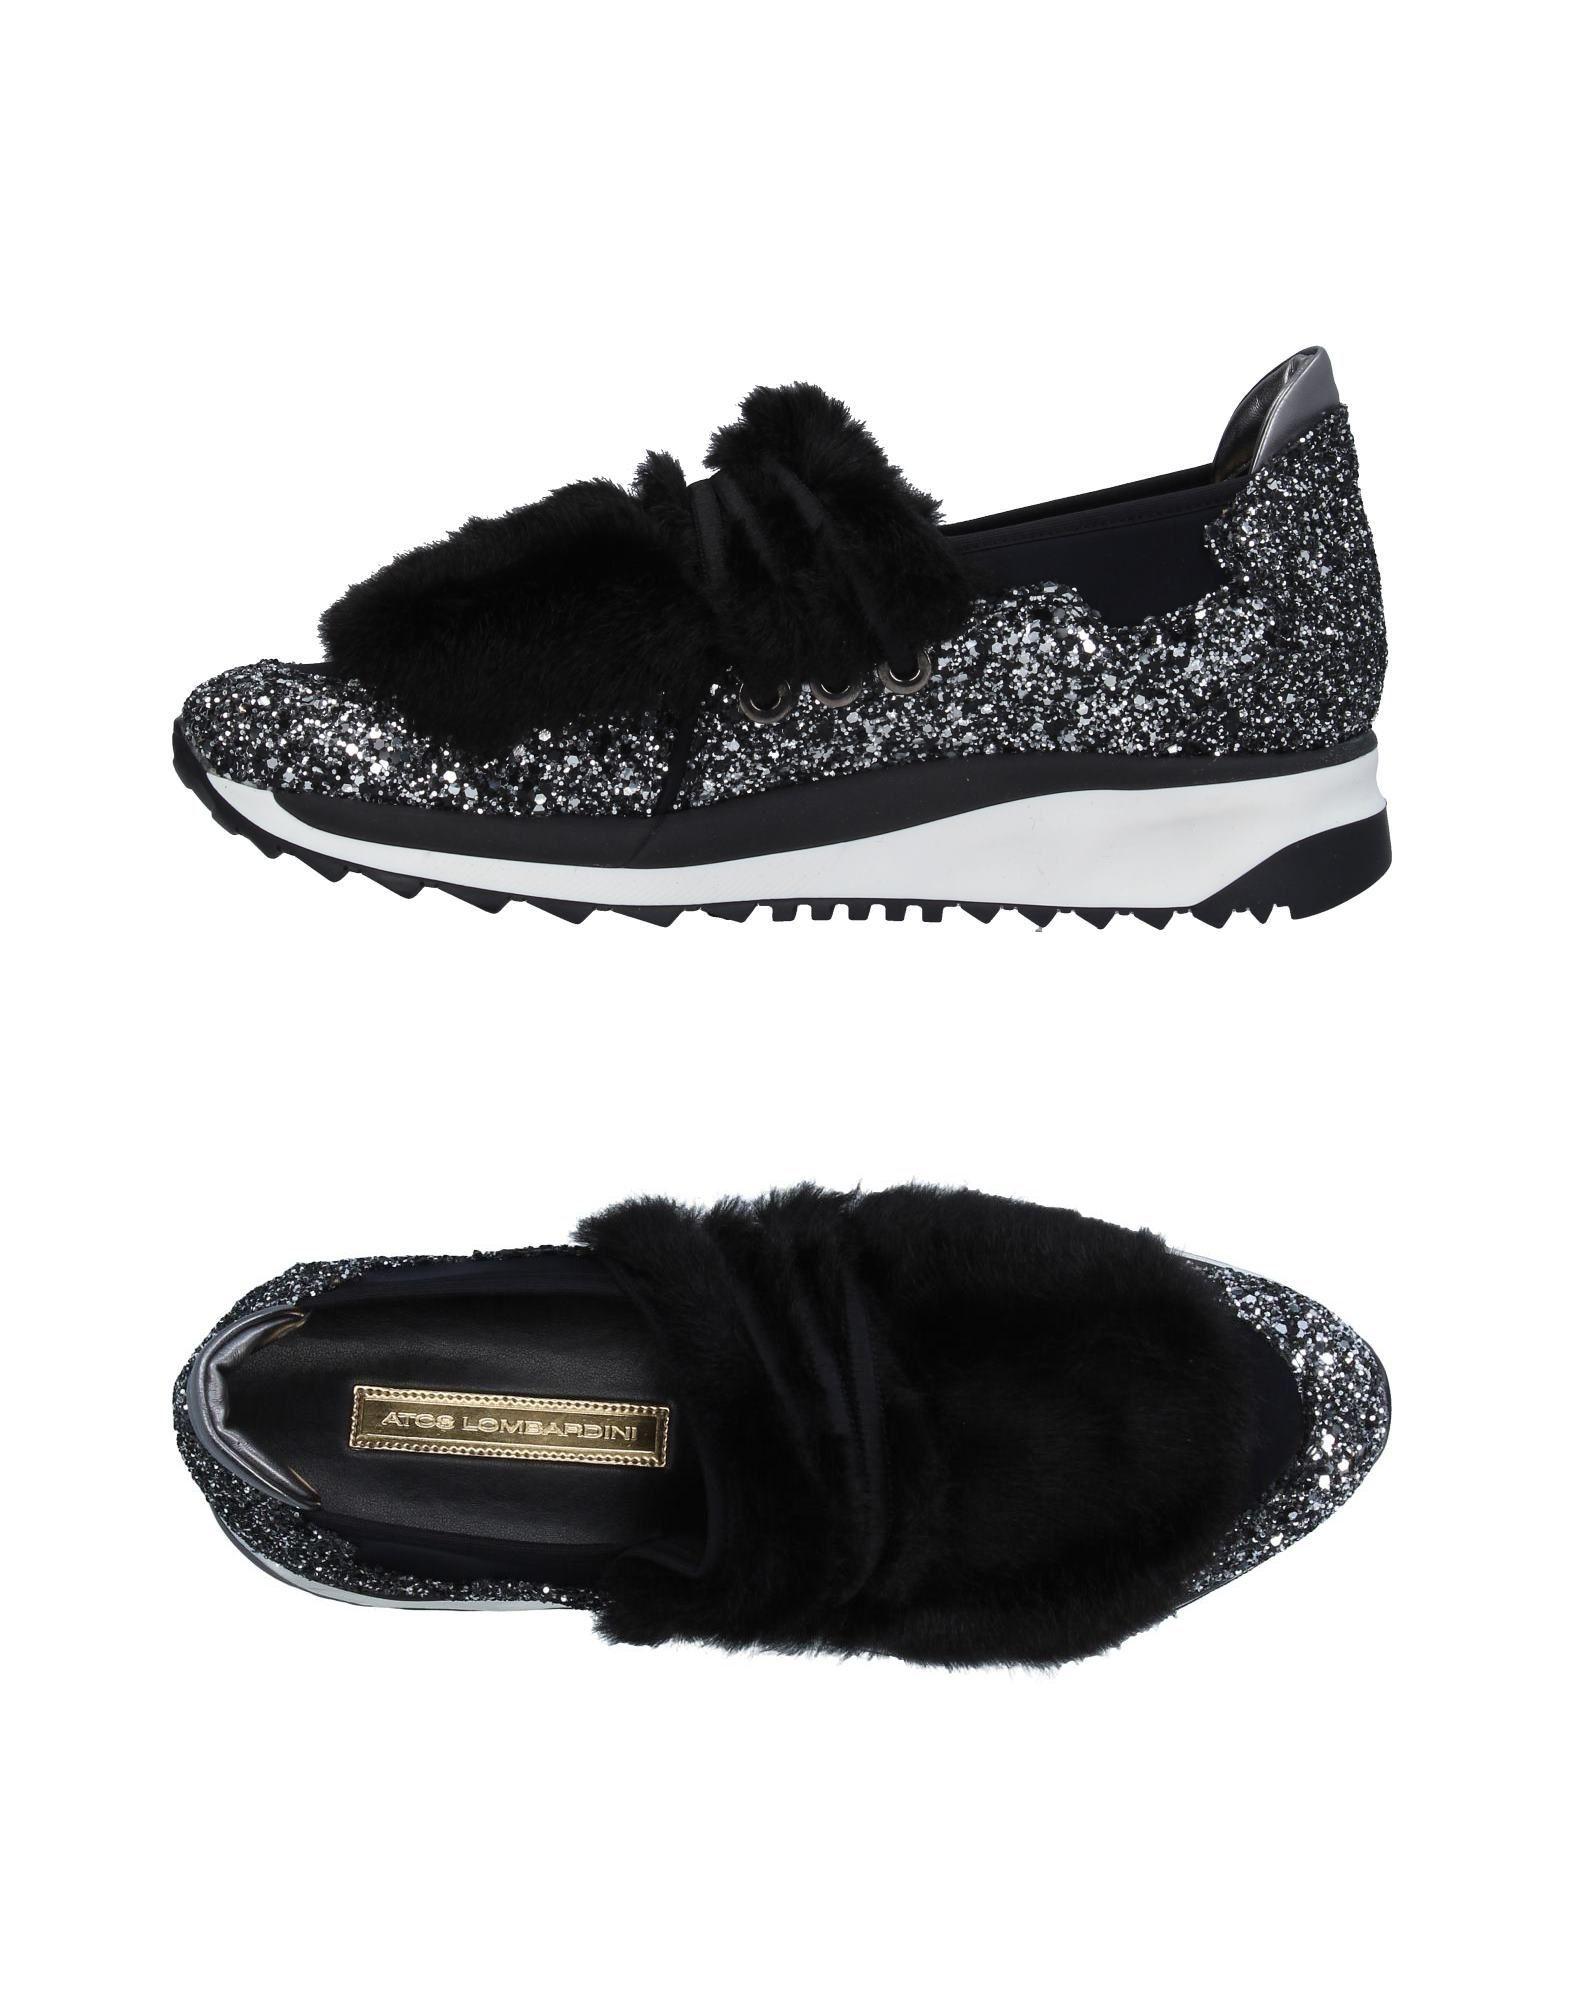 Sneakers Atos Lombardini Donna - 11277401UR